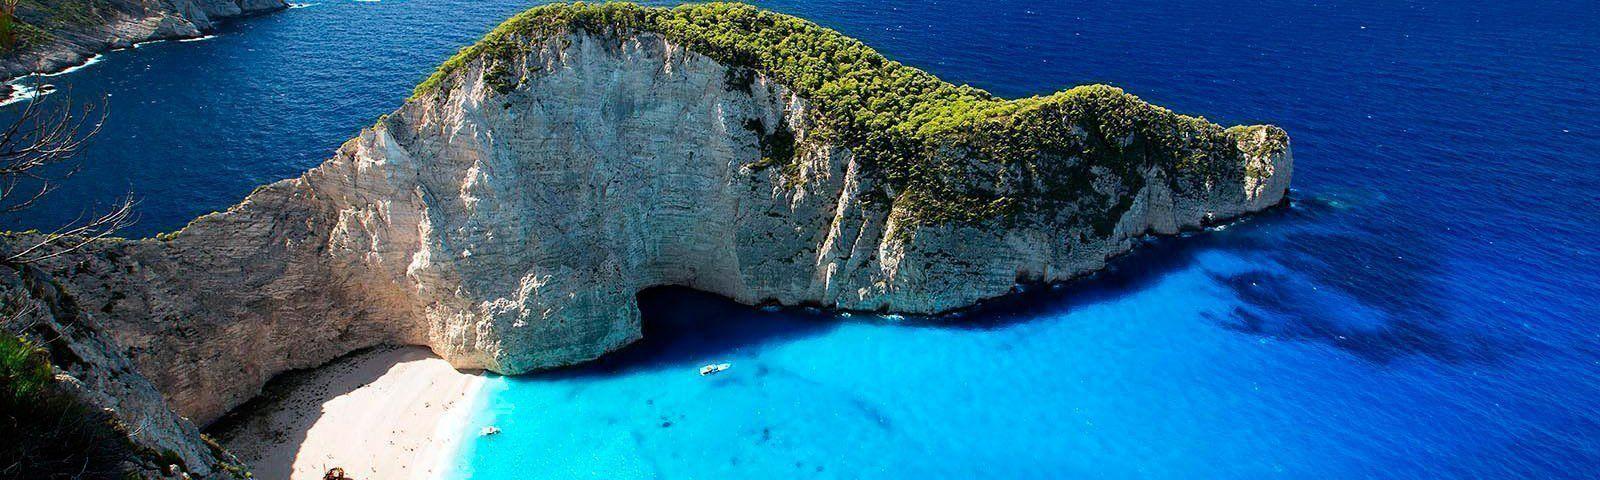 viaje-grecia-velero-playa-naufragio